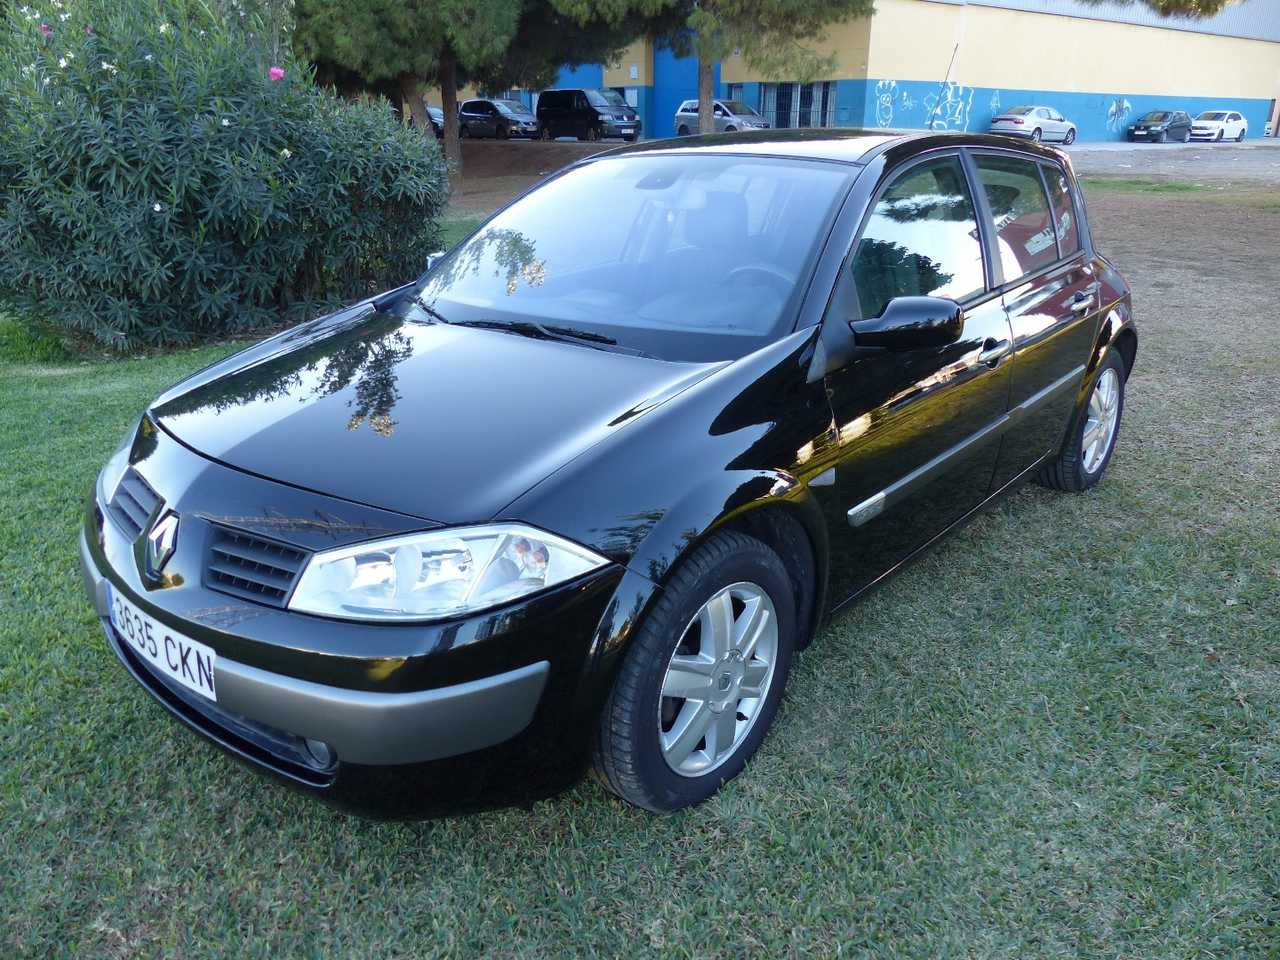 Renault Megane 1.9 DCi Confort DYNAMIQUE LLANTAS   - Foto 1